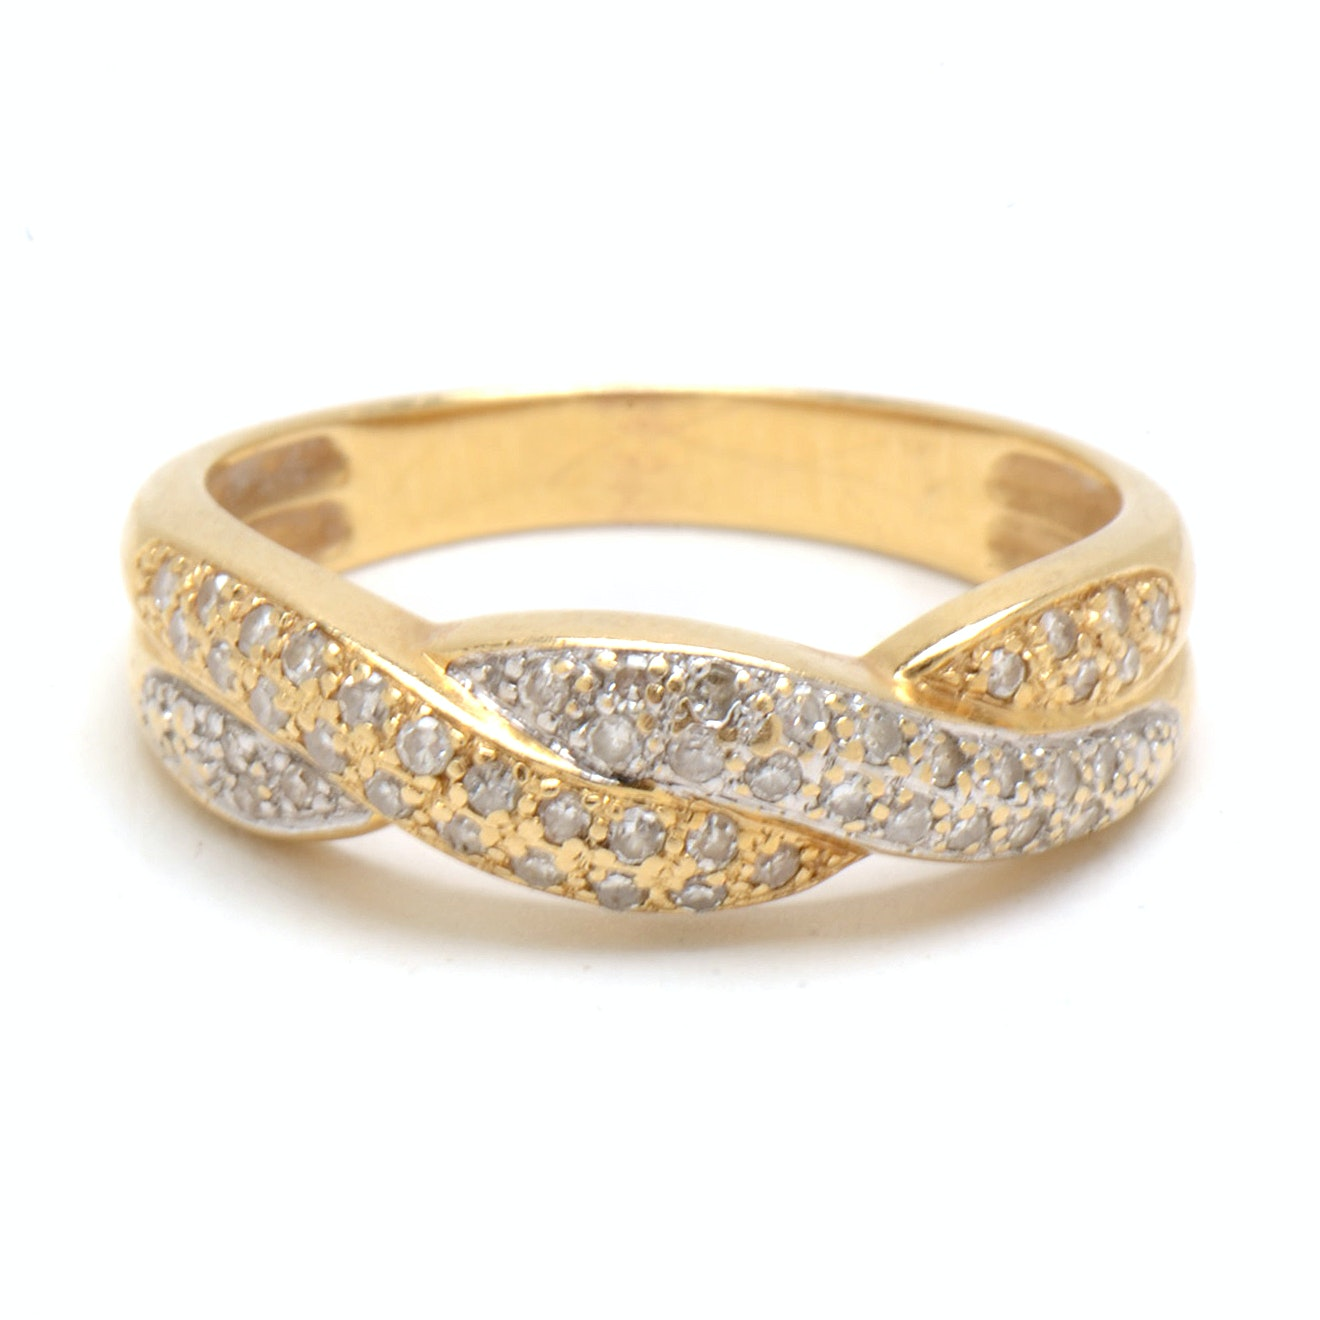 14K Yellow Gold Diamond Twisted Band Ring